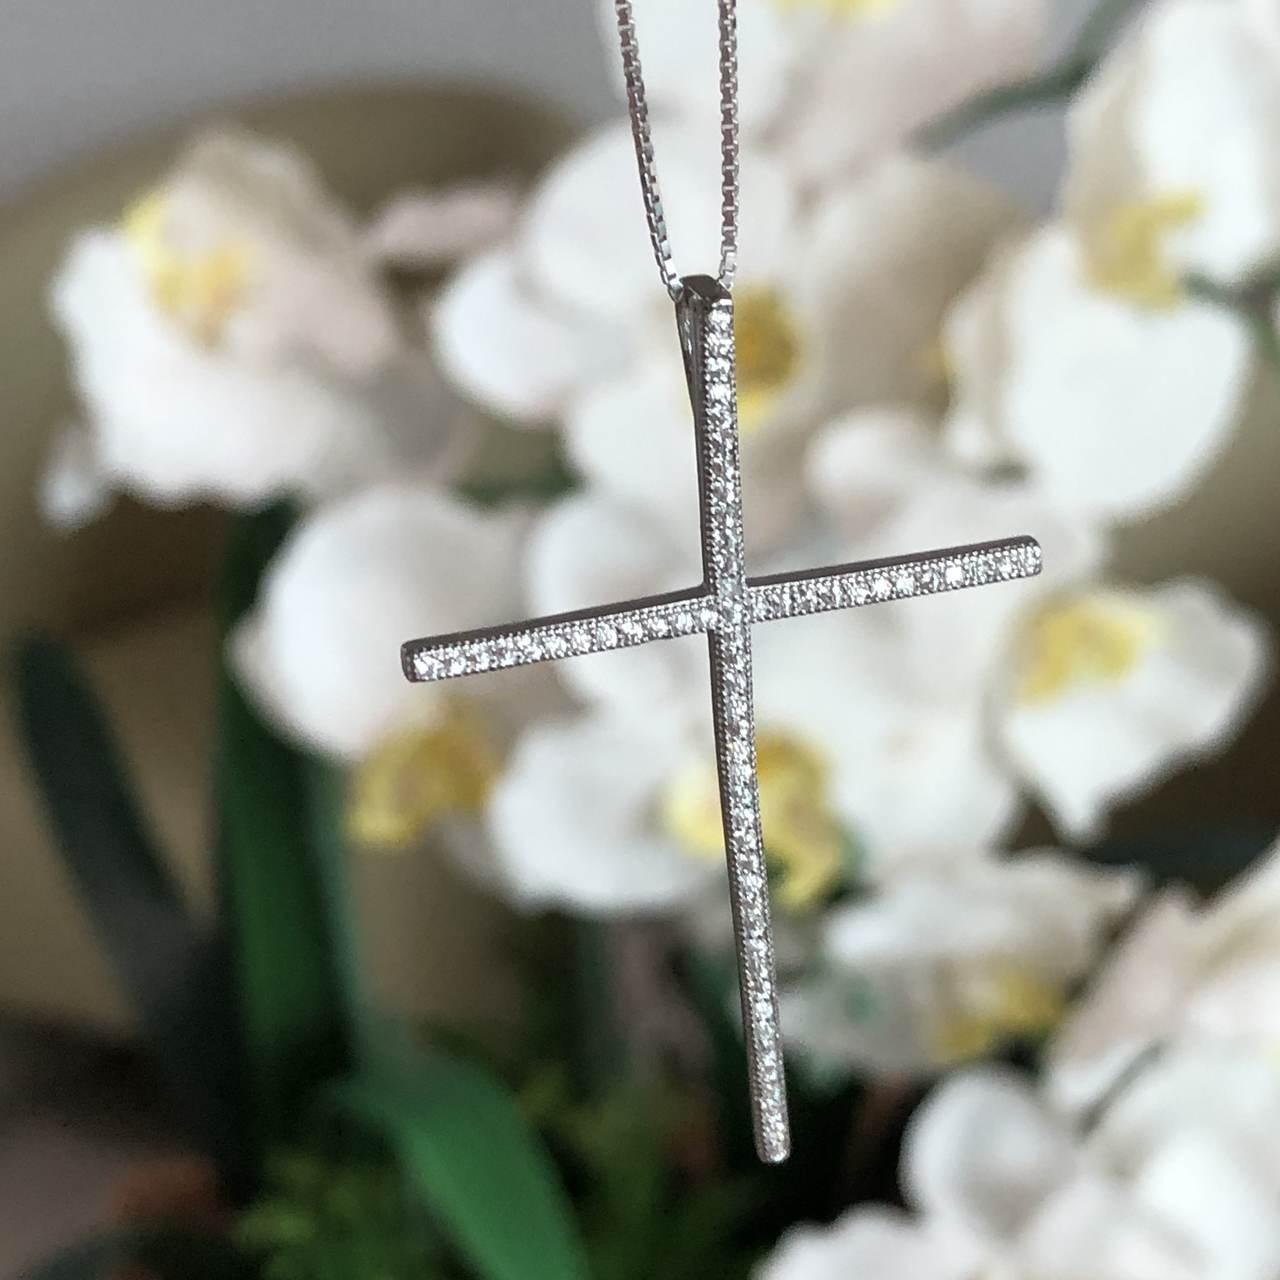 Pingente de Prata 925 Cruz Cravejada Zircônia Cristal